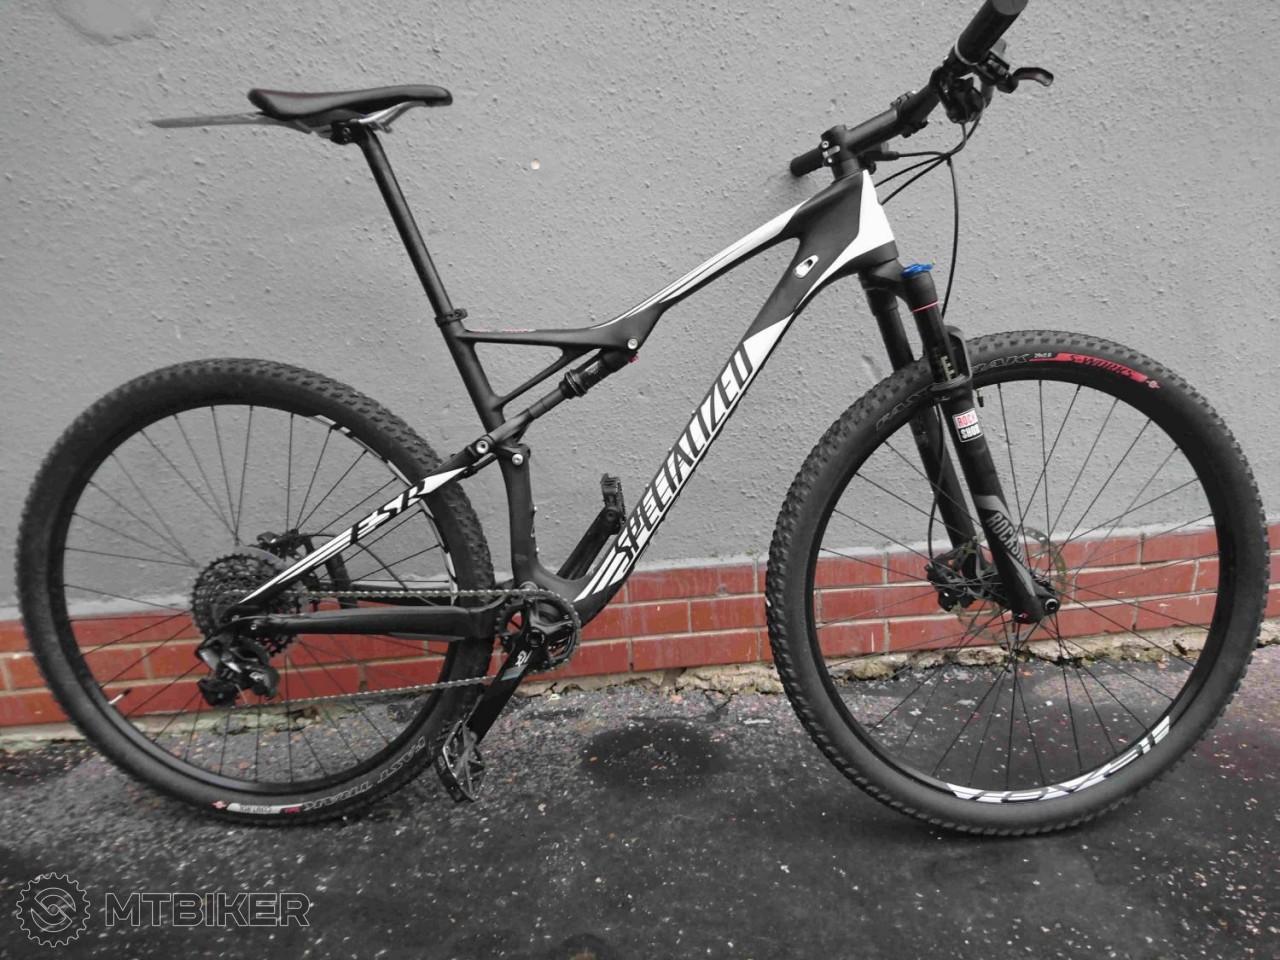 f321aae6f0a6b Specialized Epic Comp Carbon 29 World Cup - Bicykle - Celoodpružené - Bazár  MTBIKER